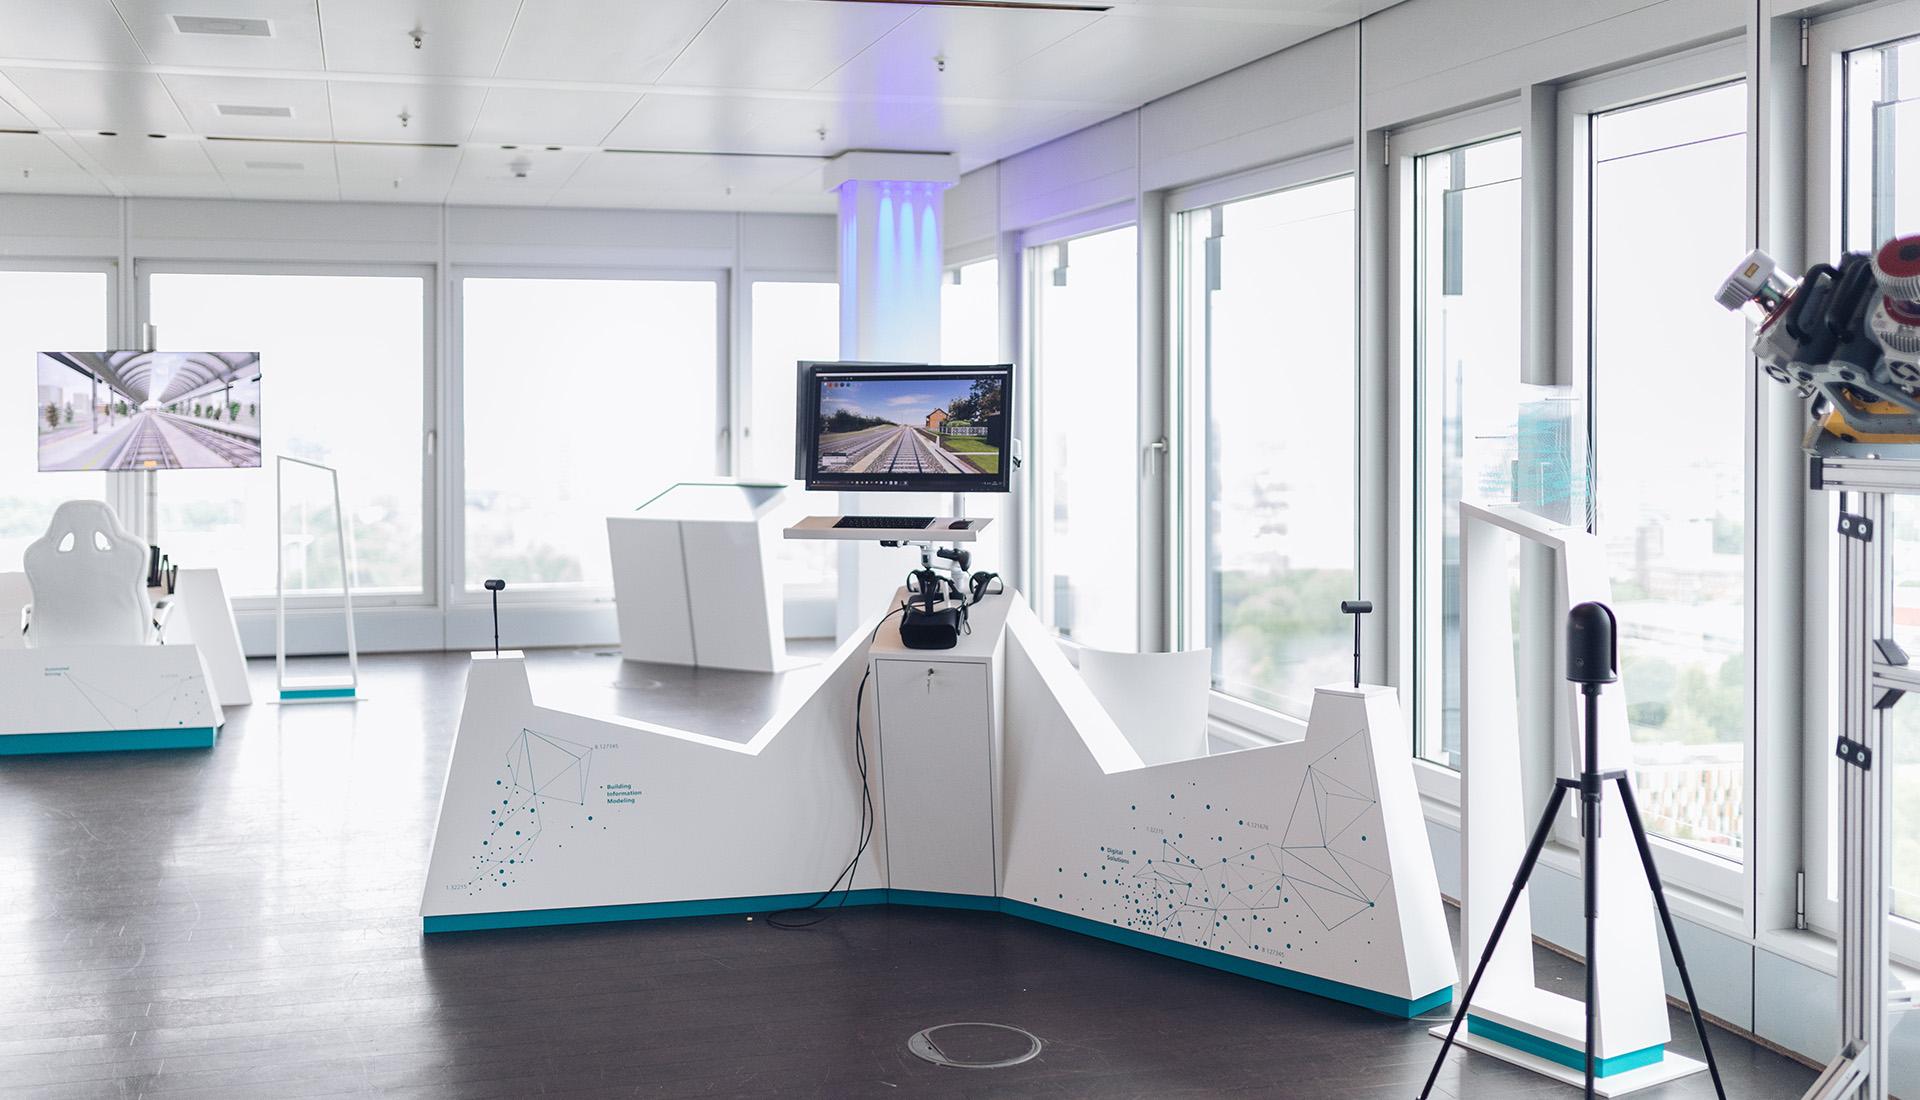 Showroom Siemens | Showroom Bau | Maedebach Braunschweig |